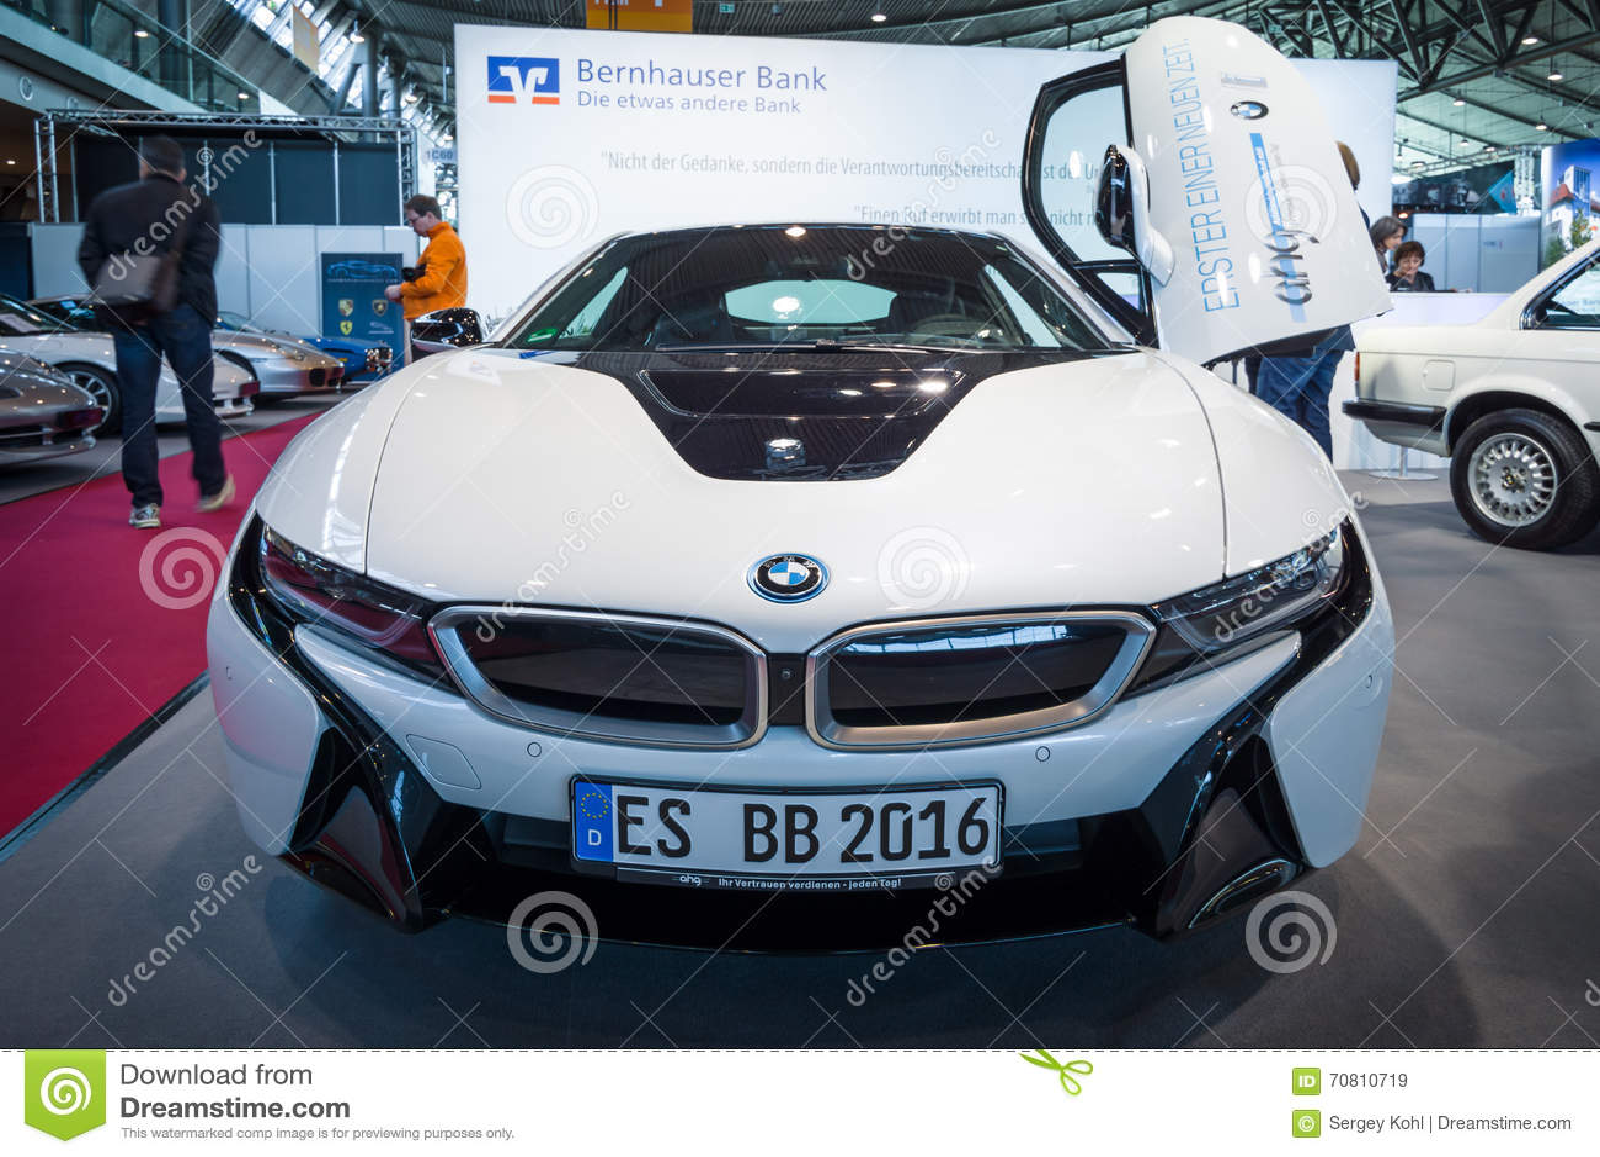 plug-in hybrid sports car bmw i8. editorial stock image - image of